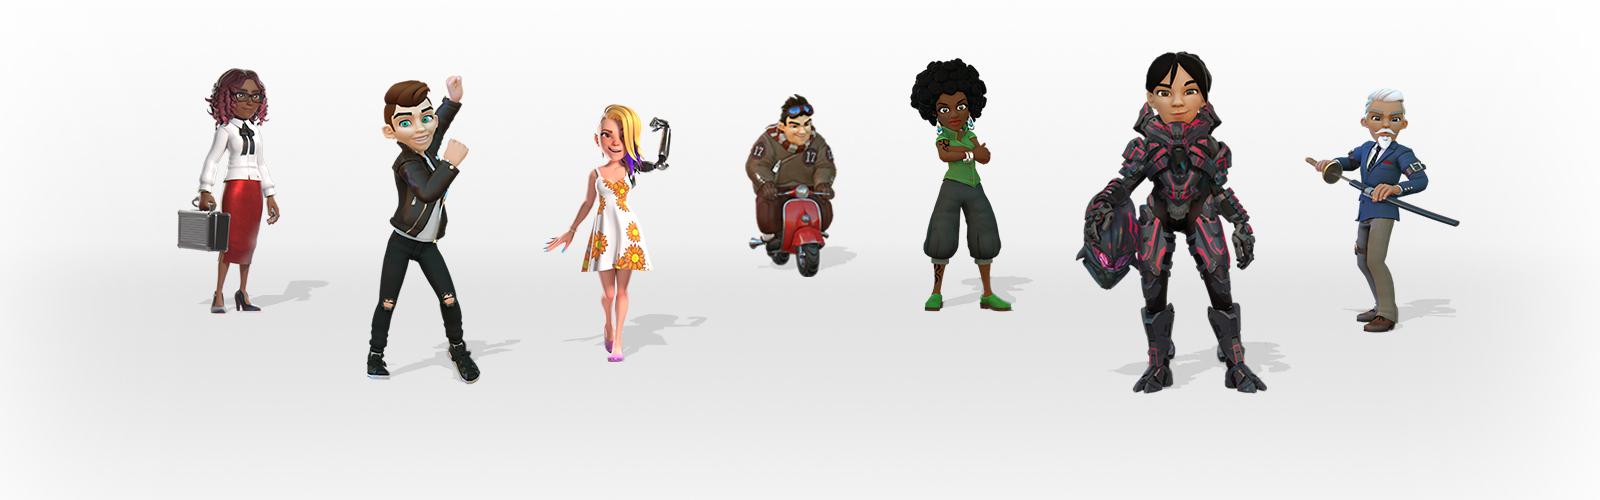 XBOX ONE X Brings All New Avatars